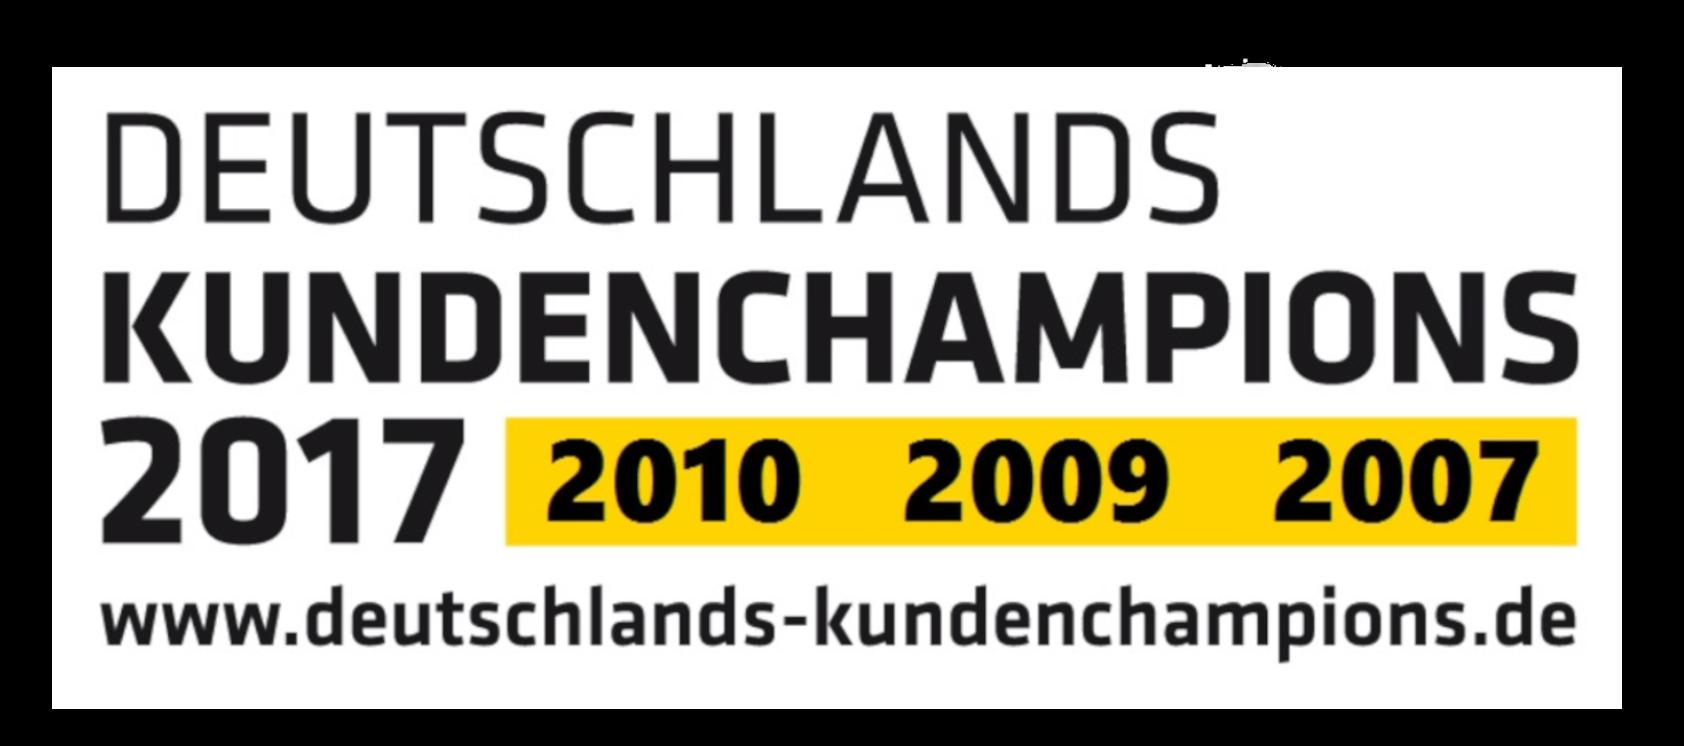 kundenchampions-2017